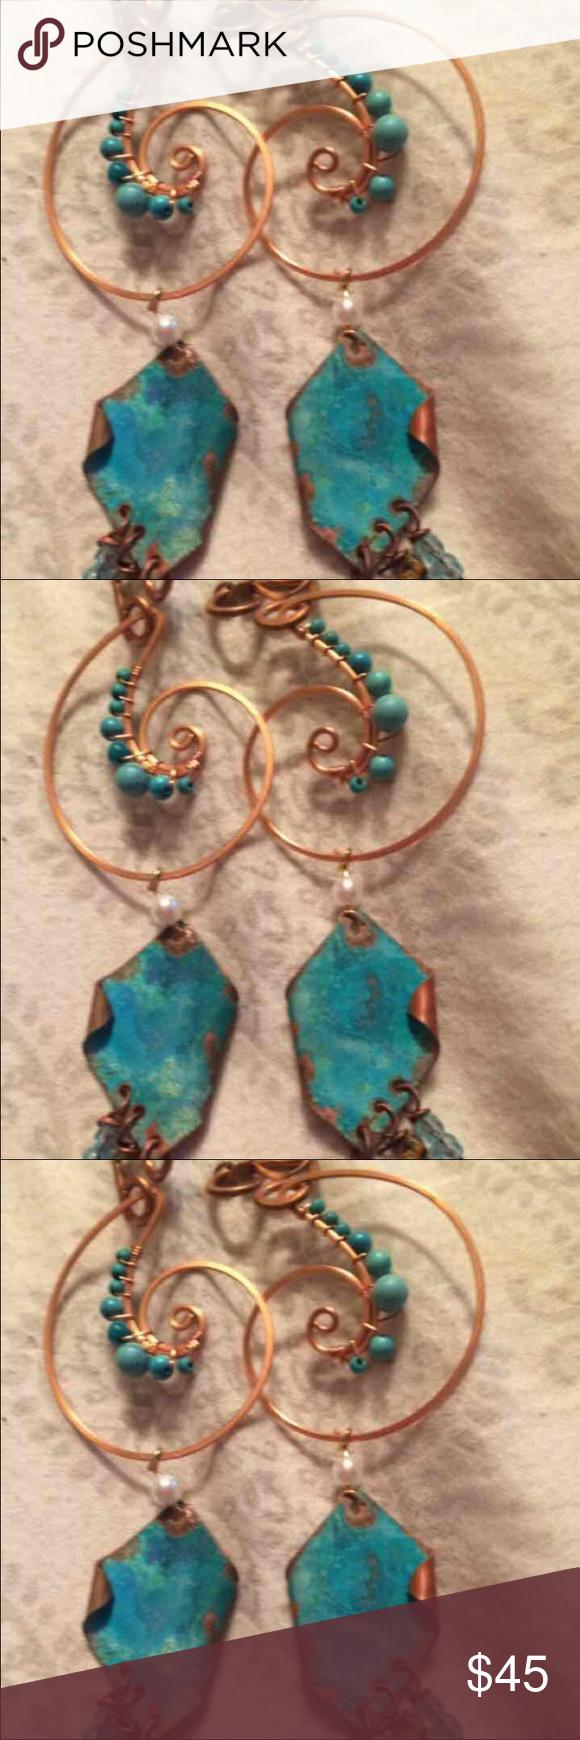 Handmade Gold/Turquoise Earrings Beautiful Handmade Gold/Copper/Turquoise Earrings Jewelry Earrings